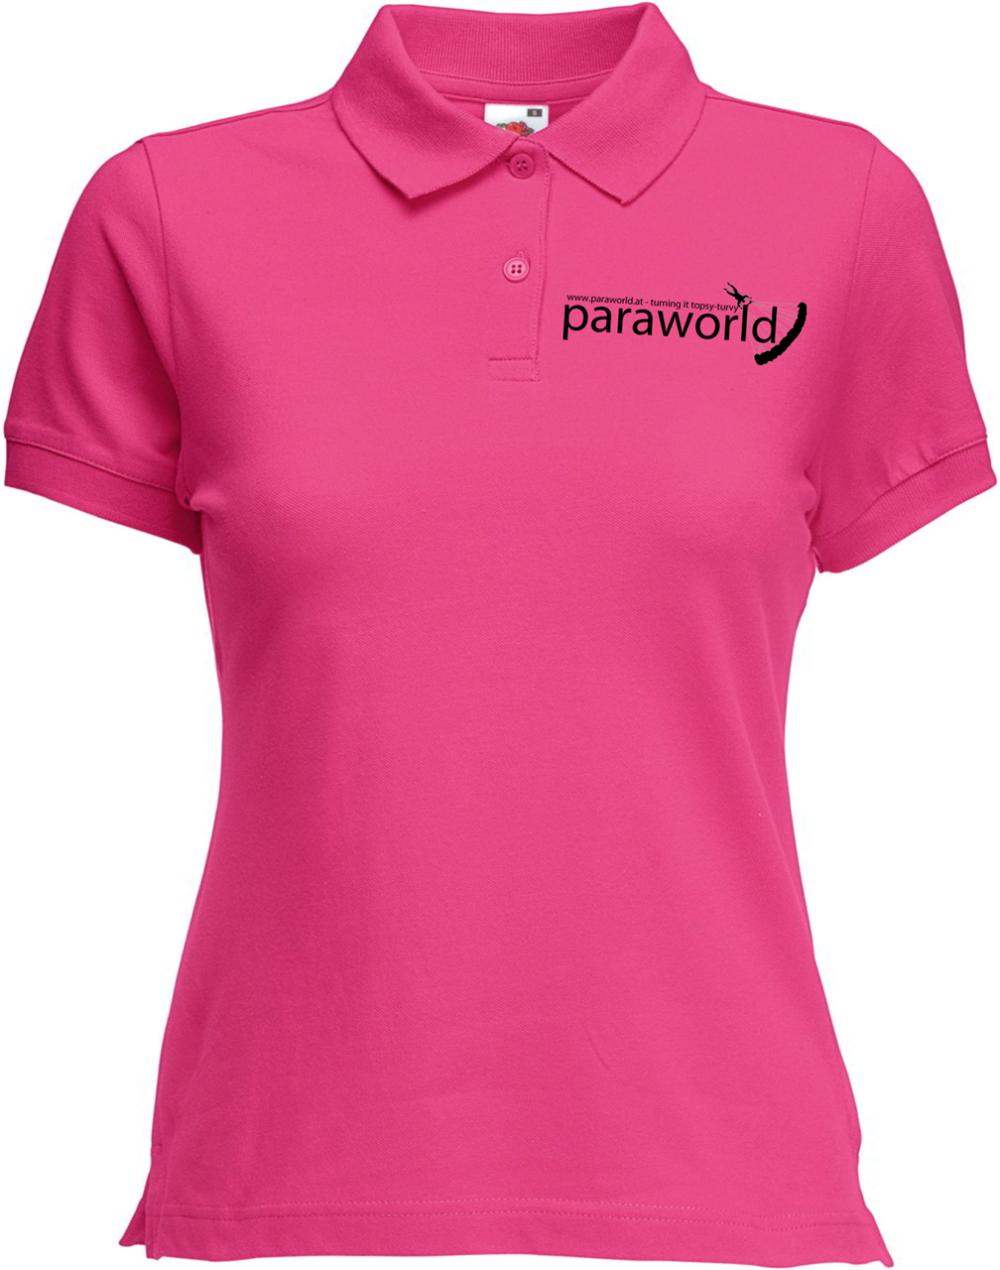 Ladies Customized Polo T Shirts With Company Logo Buy Women